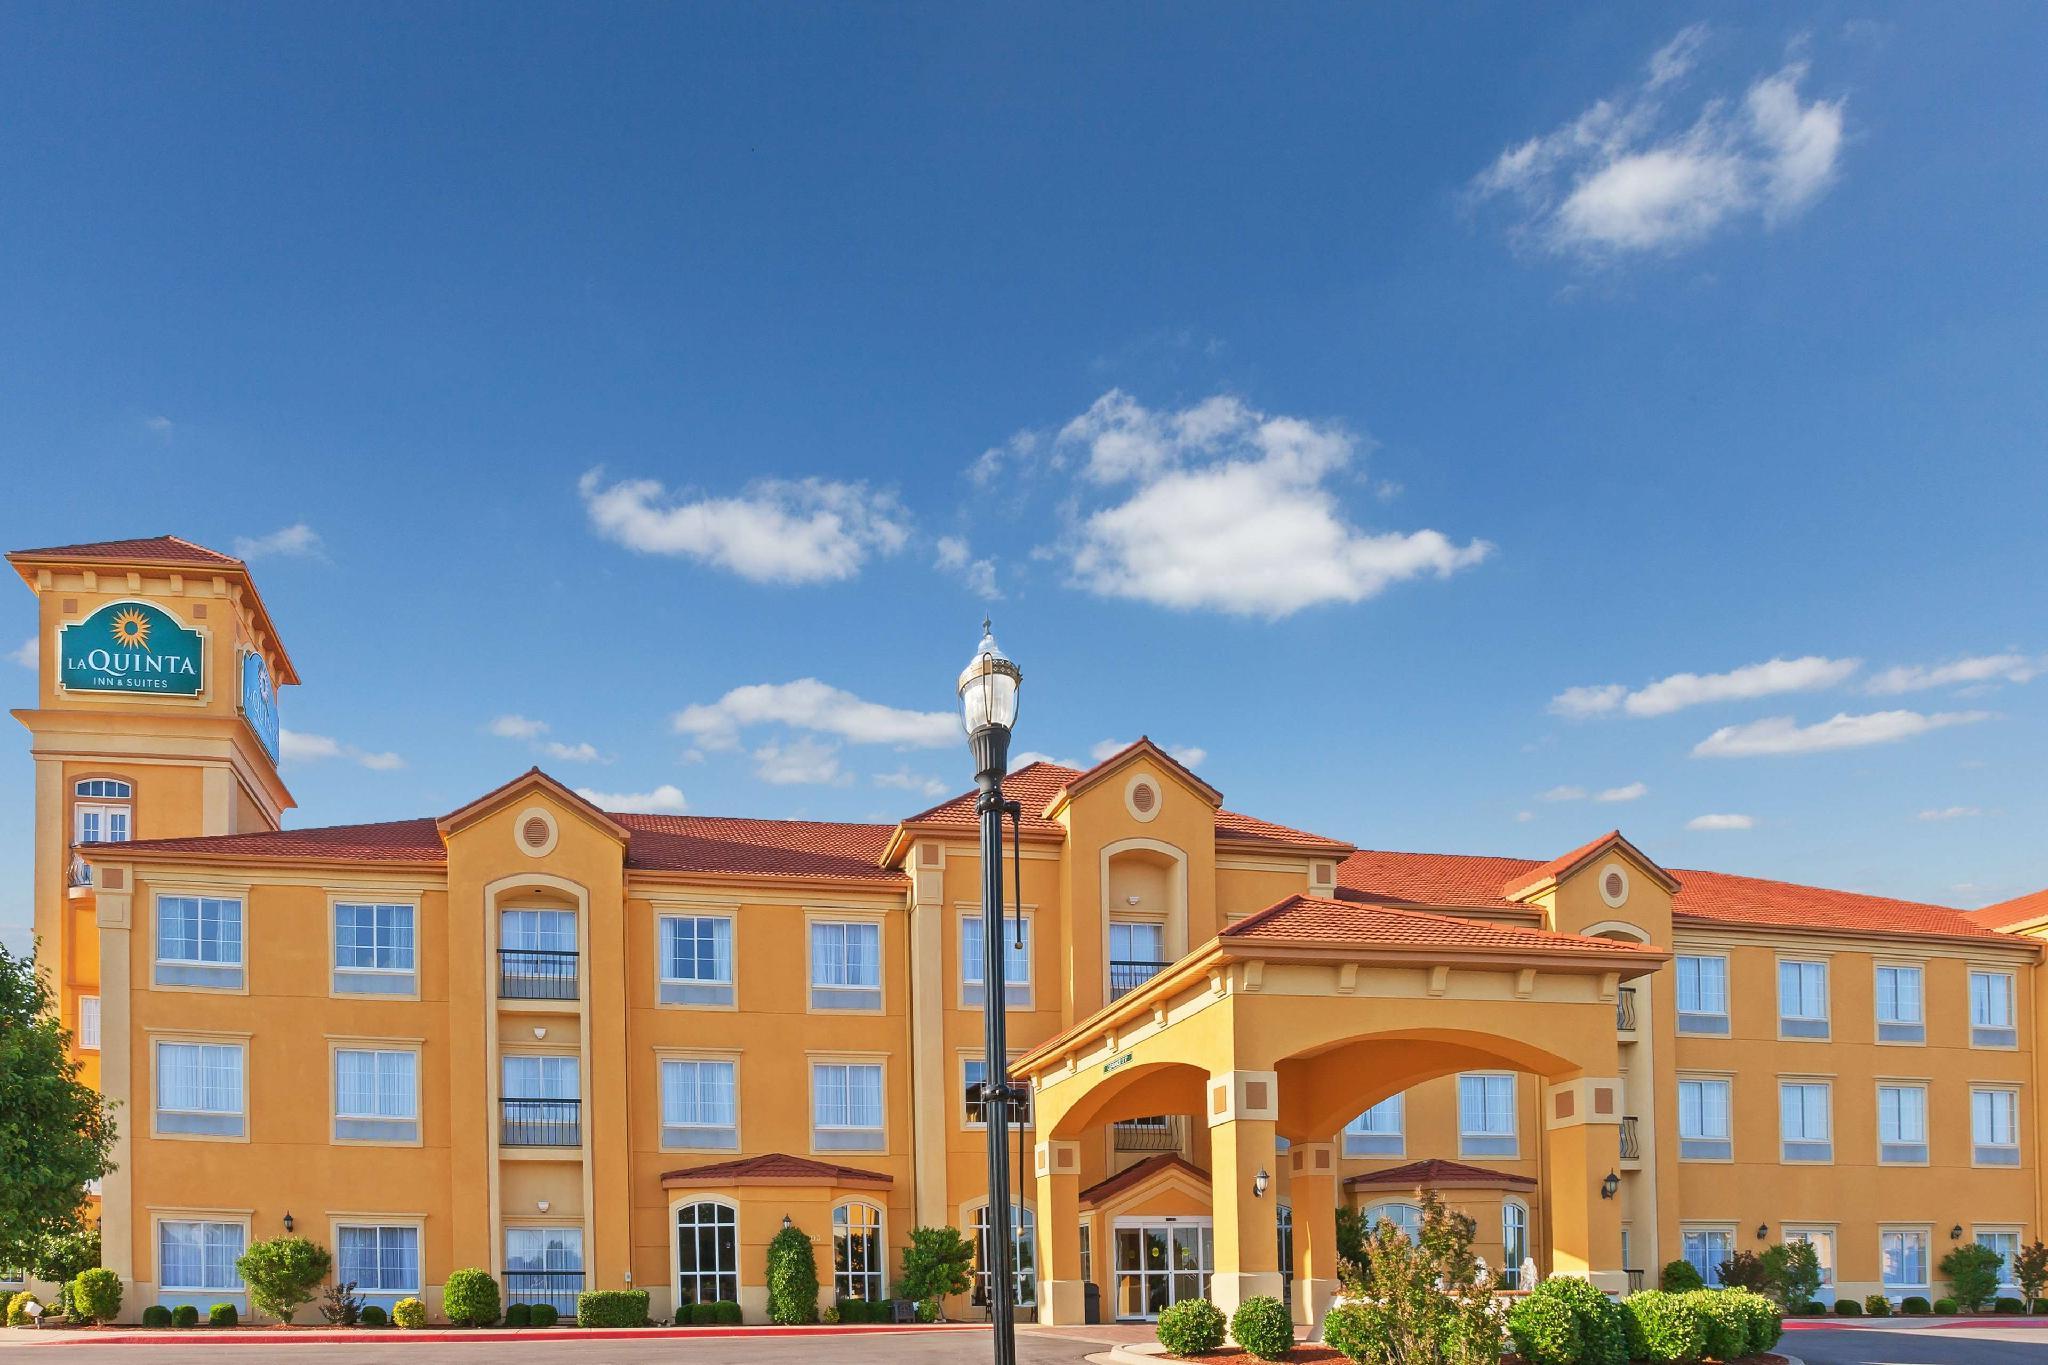 La Quinta Inn And Suites By Wyndham OKC North   Quail Springs